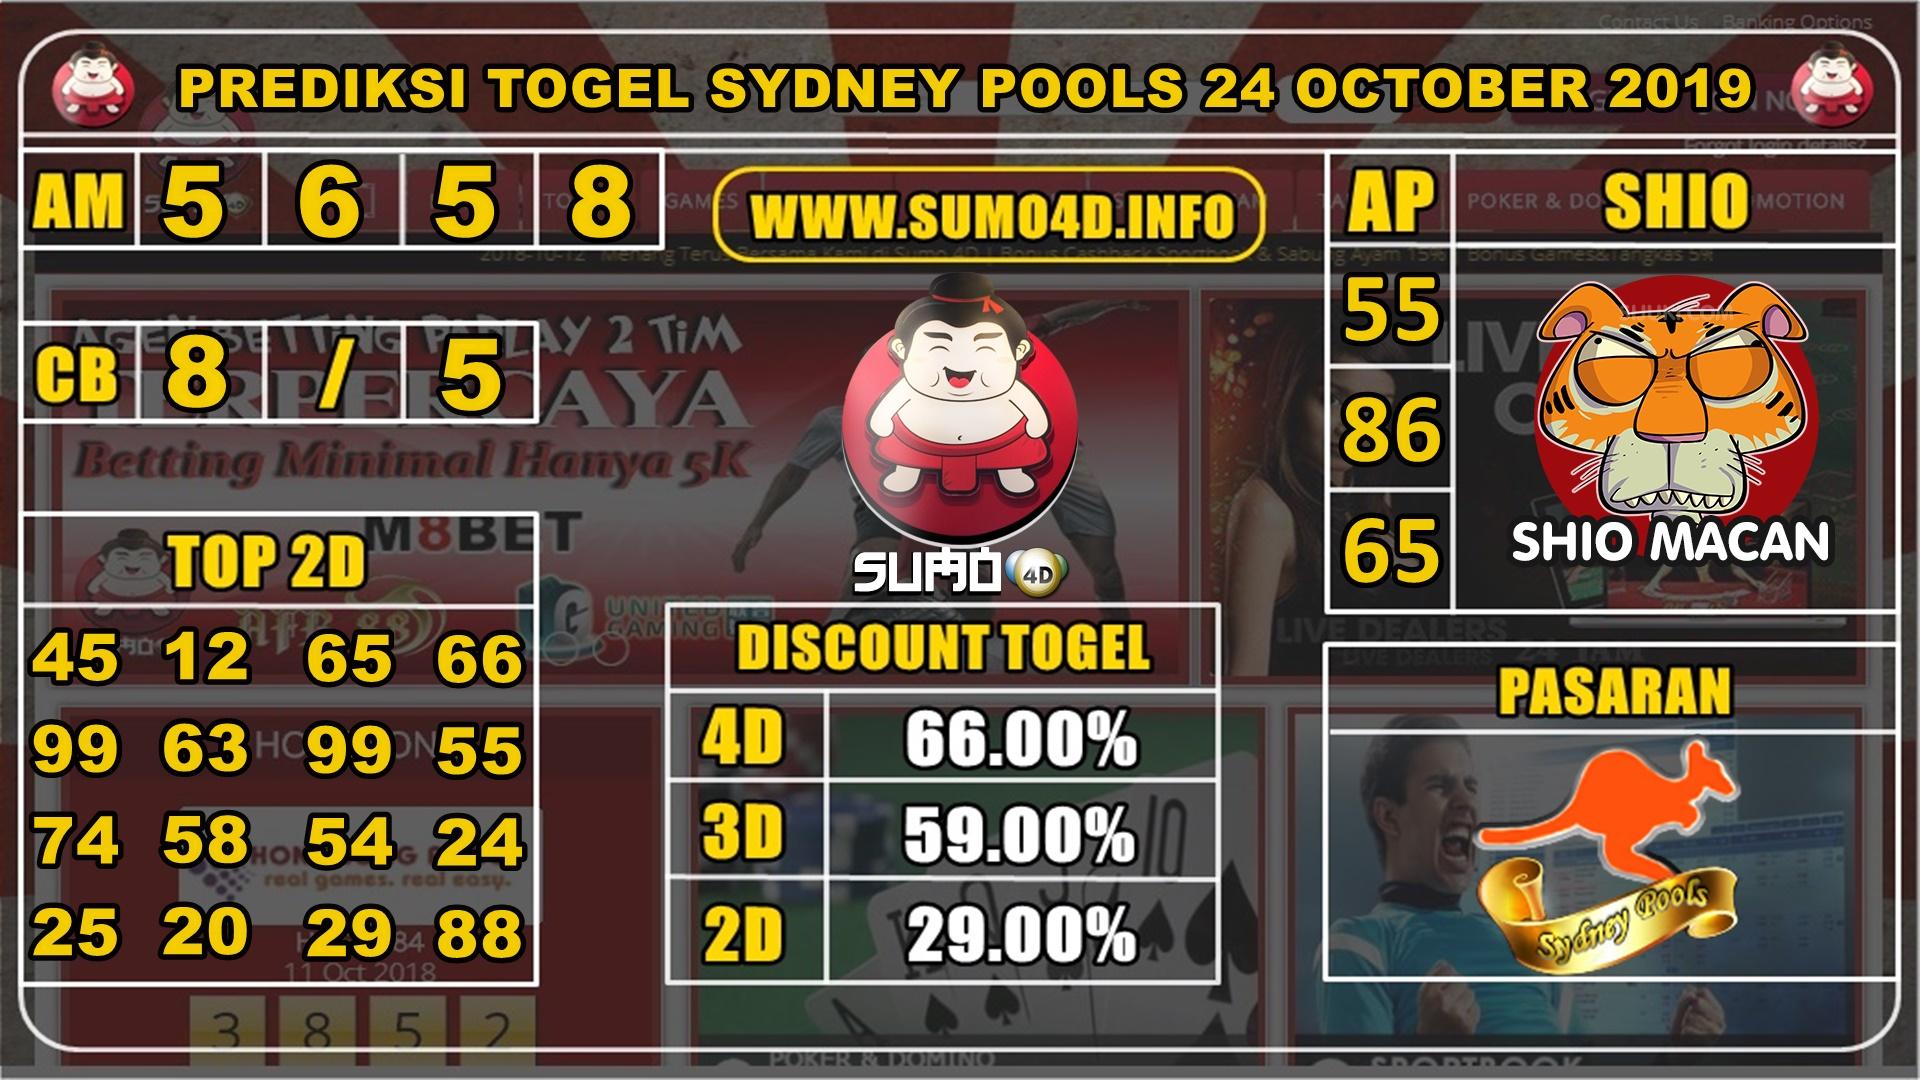 Prediksi Togel Sydney Pools 24 Oktober 2019